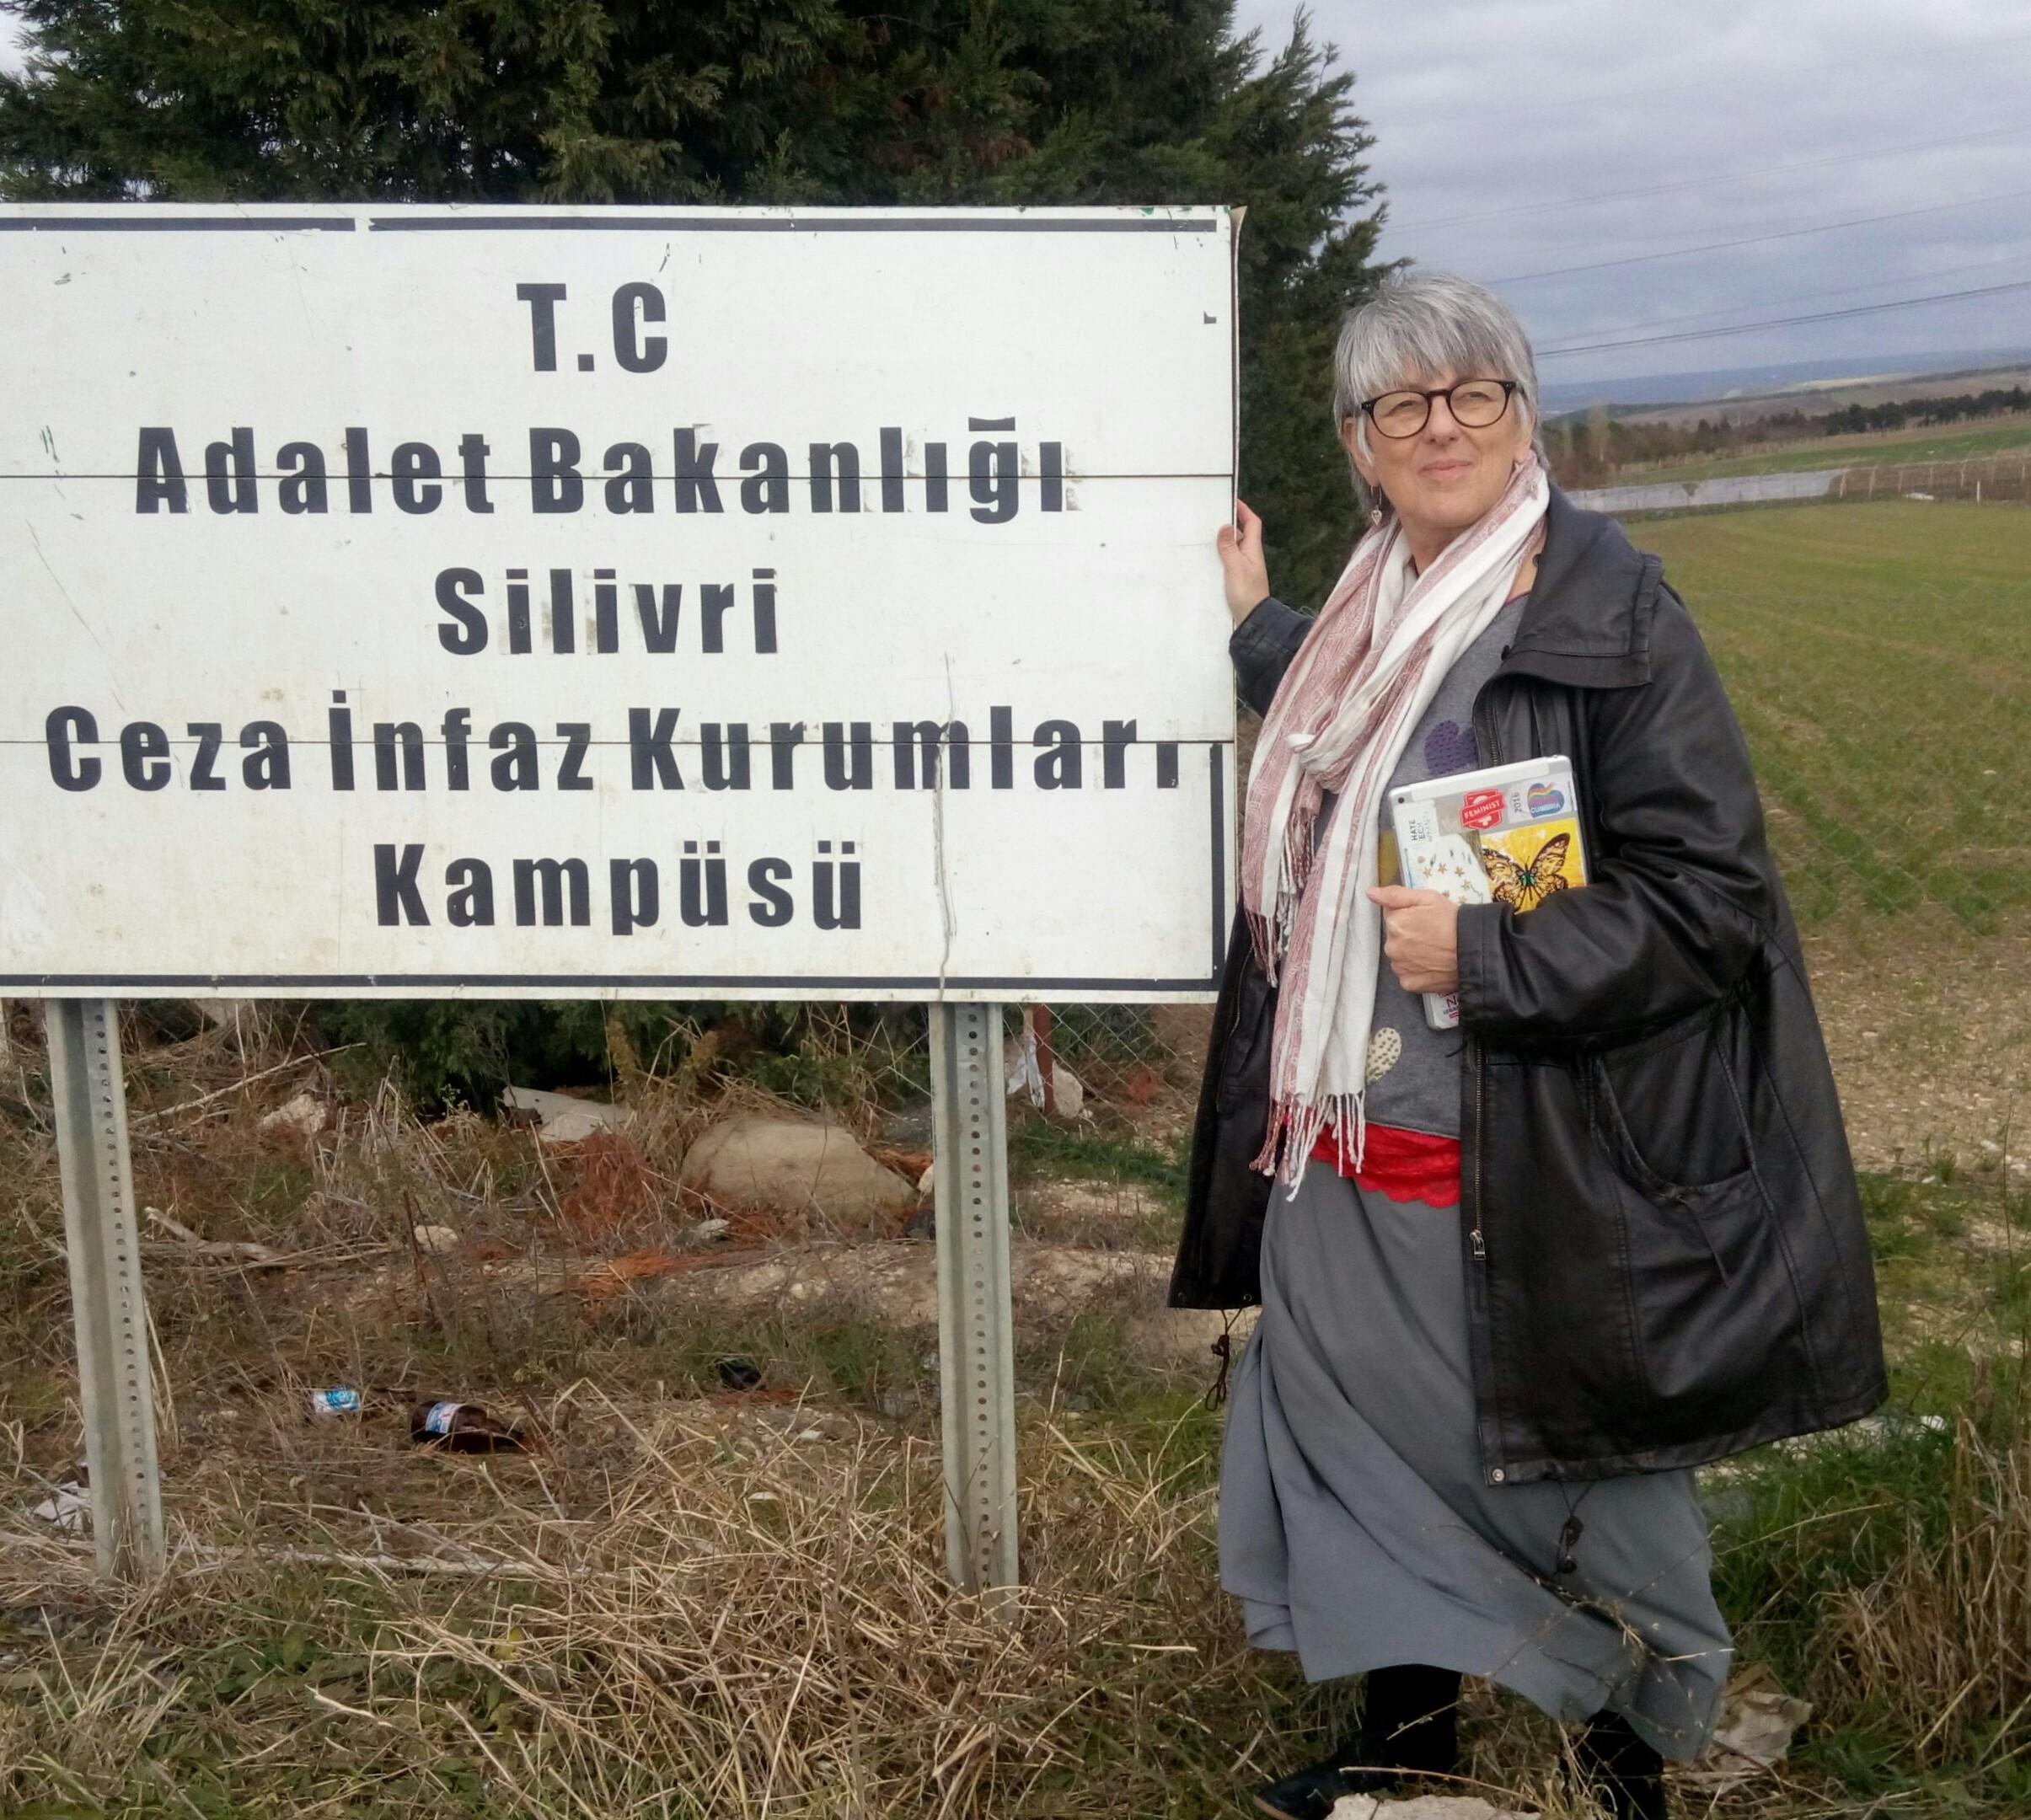 Julie_outside_Istanbul_prison.jpg